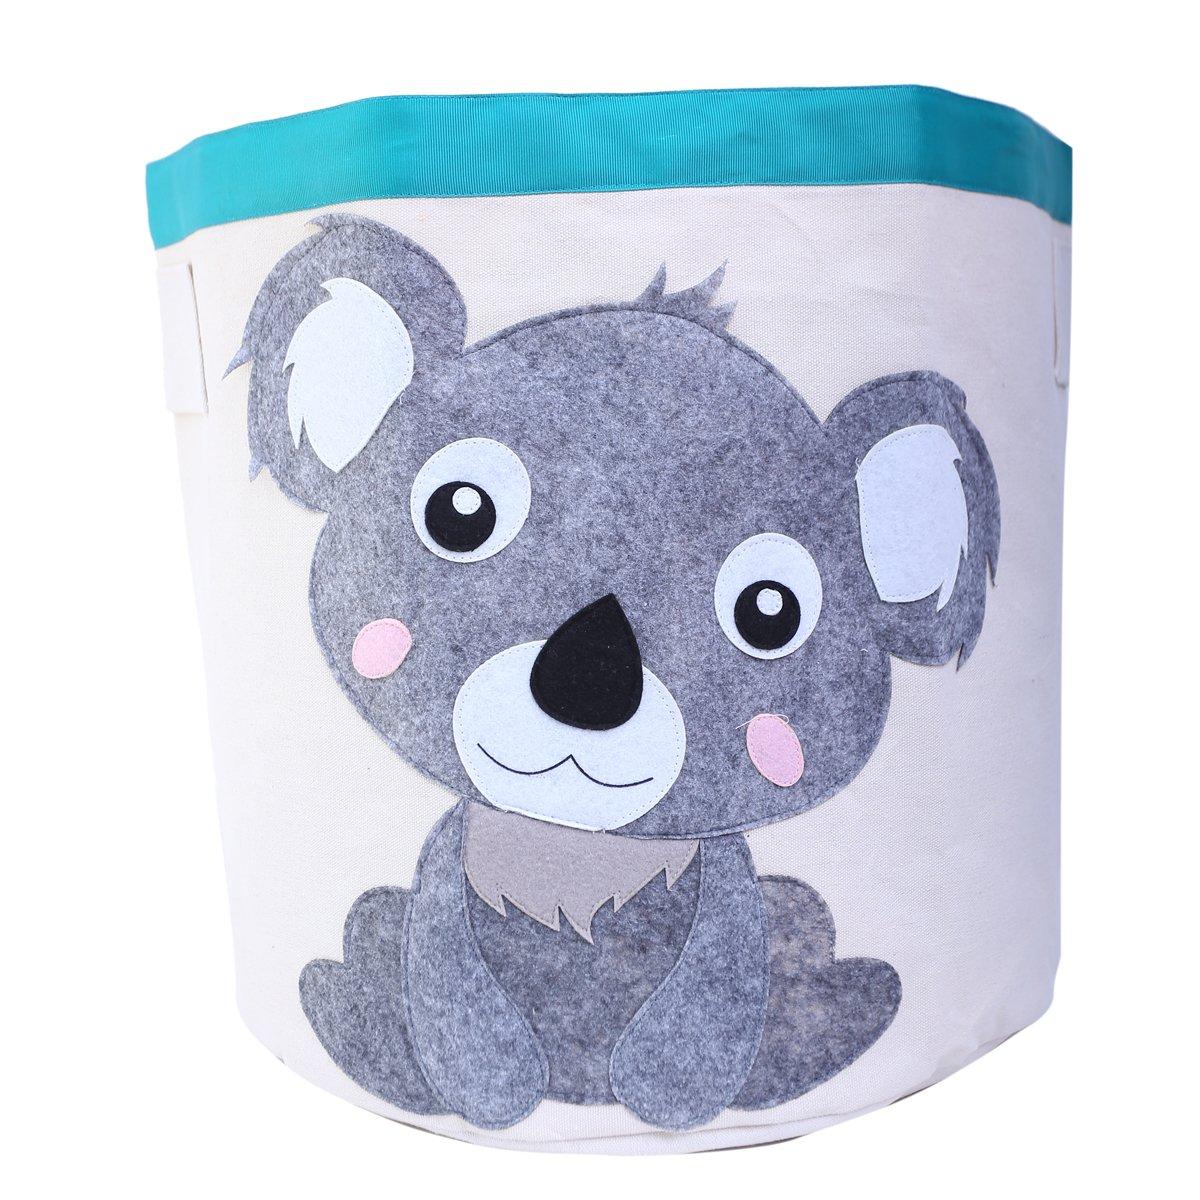 Laundry Hamper Collapsible Storage Bin Basket Canvas Column Bin Set with Handles -Waterproof Animal Design Fold Basket for Kids 17.5 x 17(Koala)